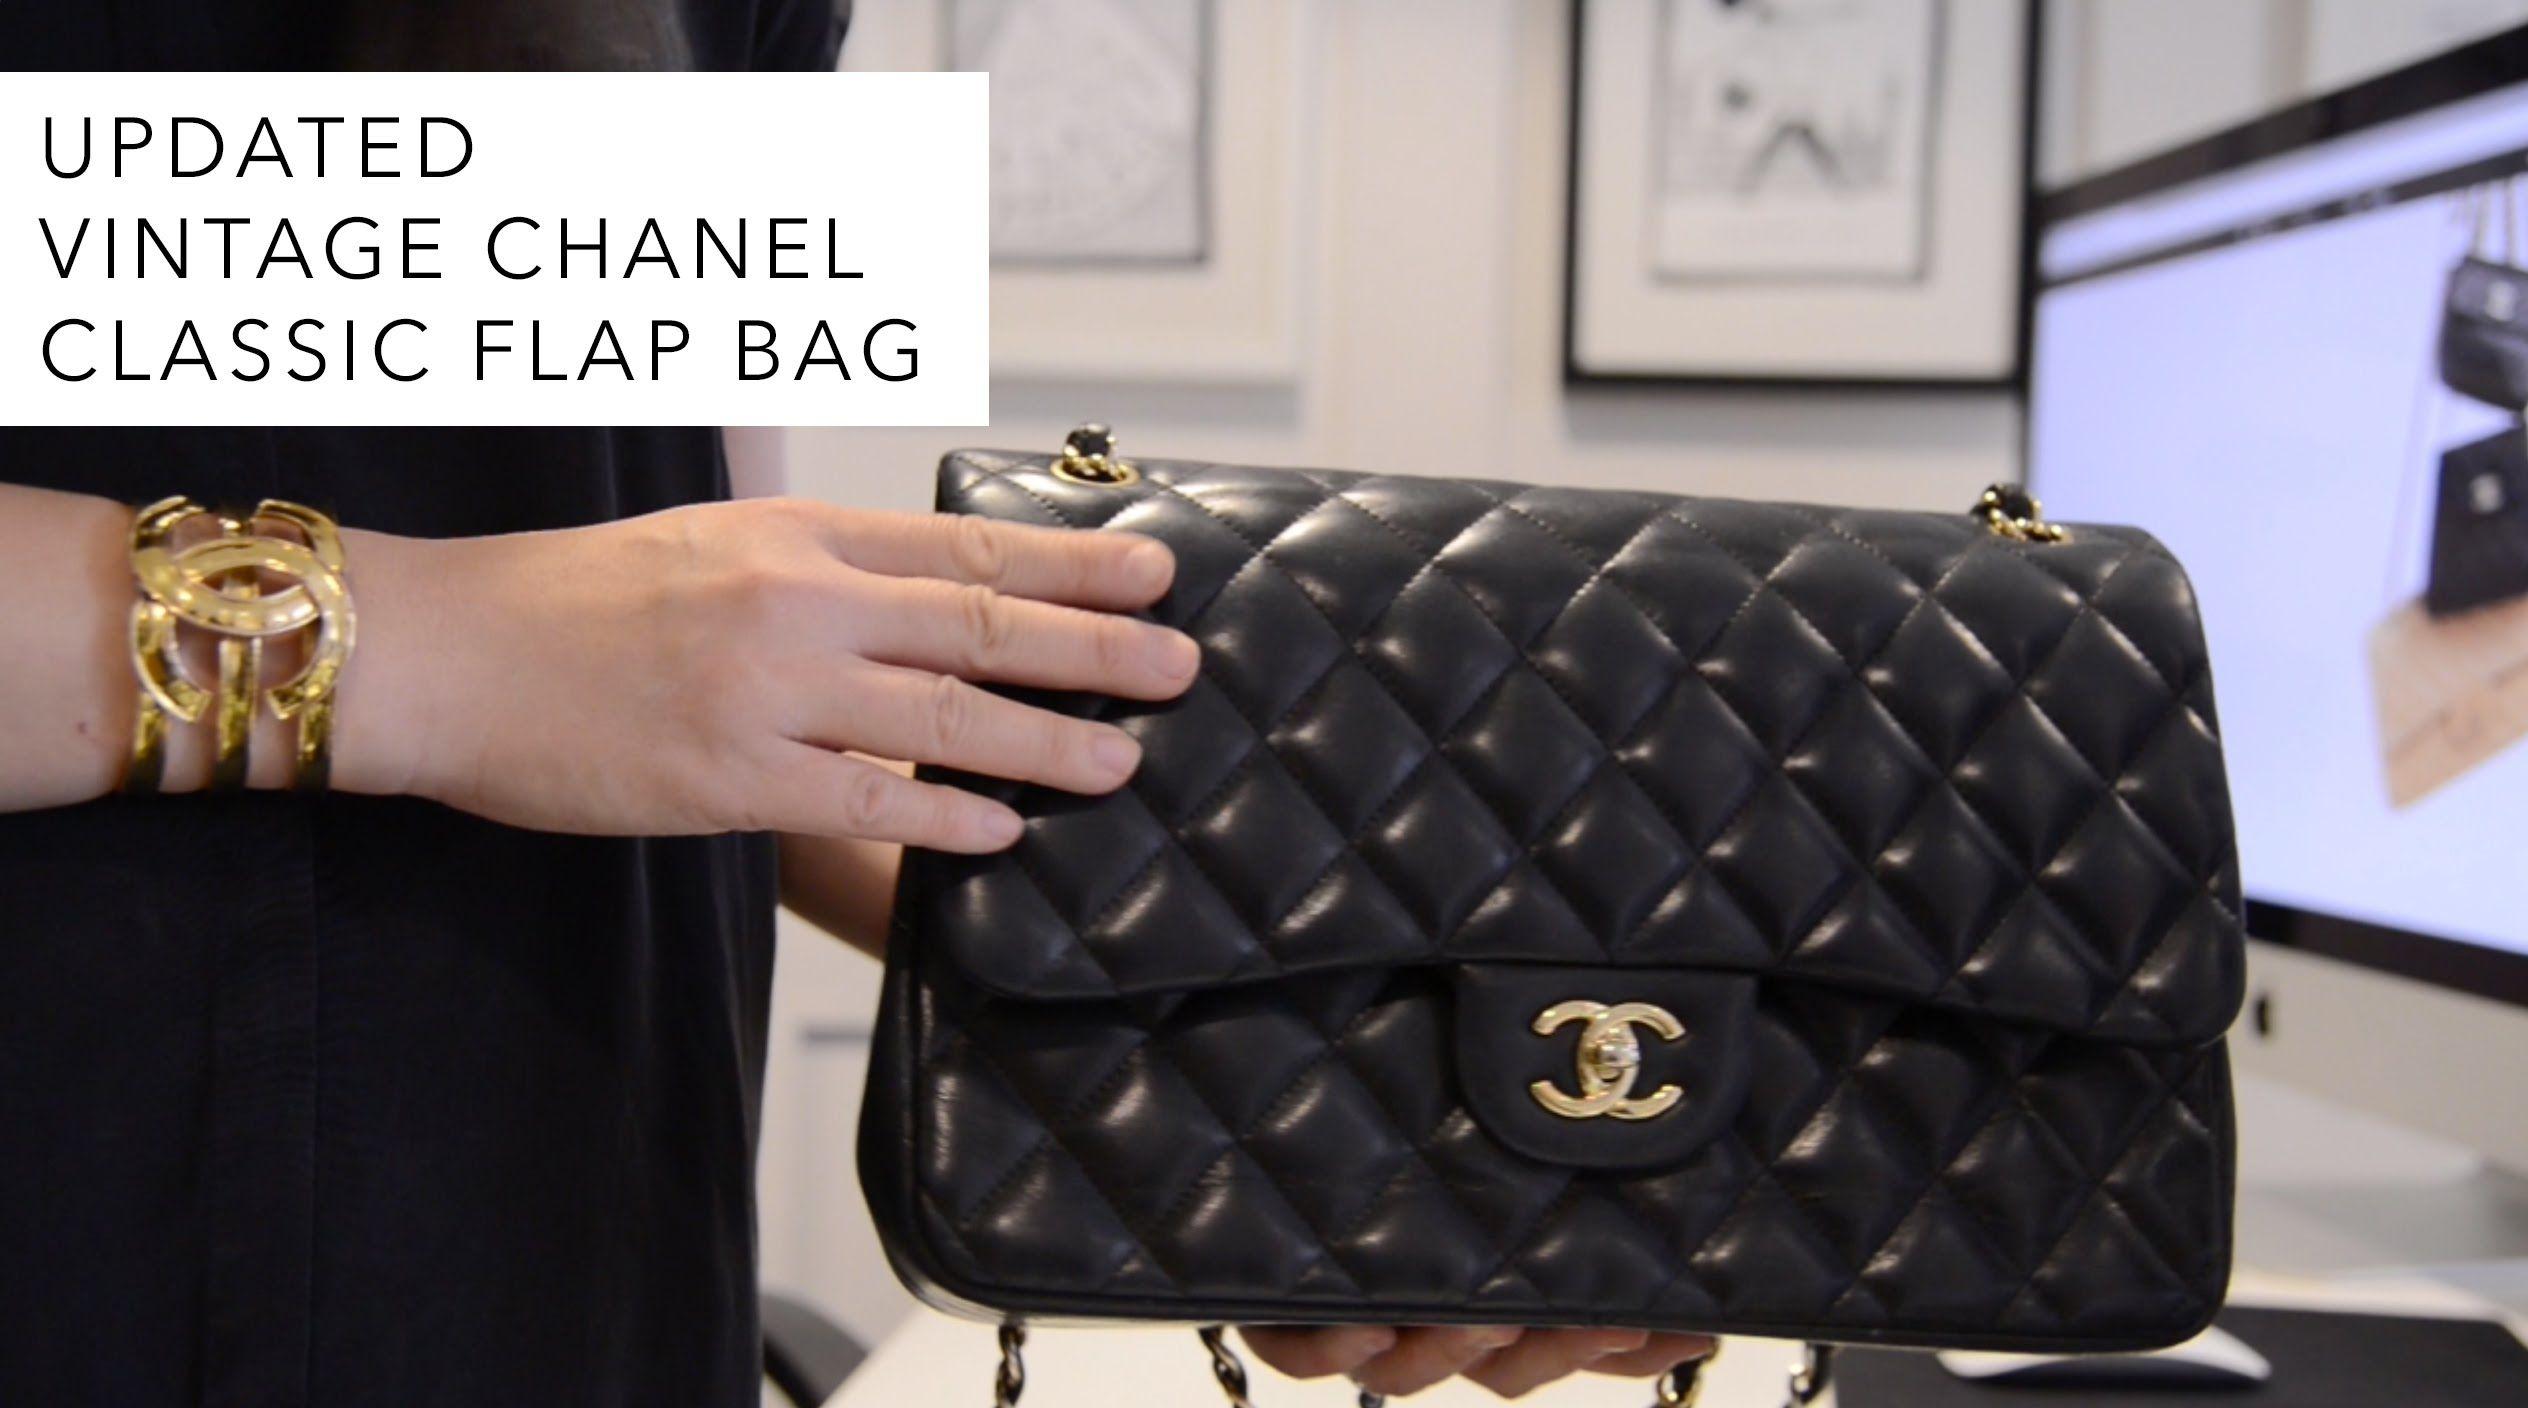 beb1ba89b95a Updated Classic Flap Bag | cute Bags | Chanel classic flap, Vintage ...